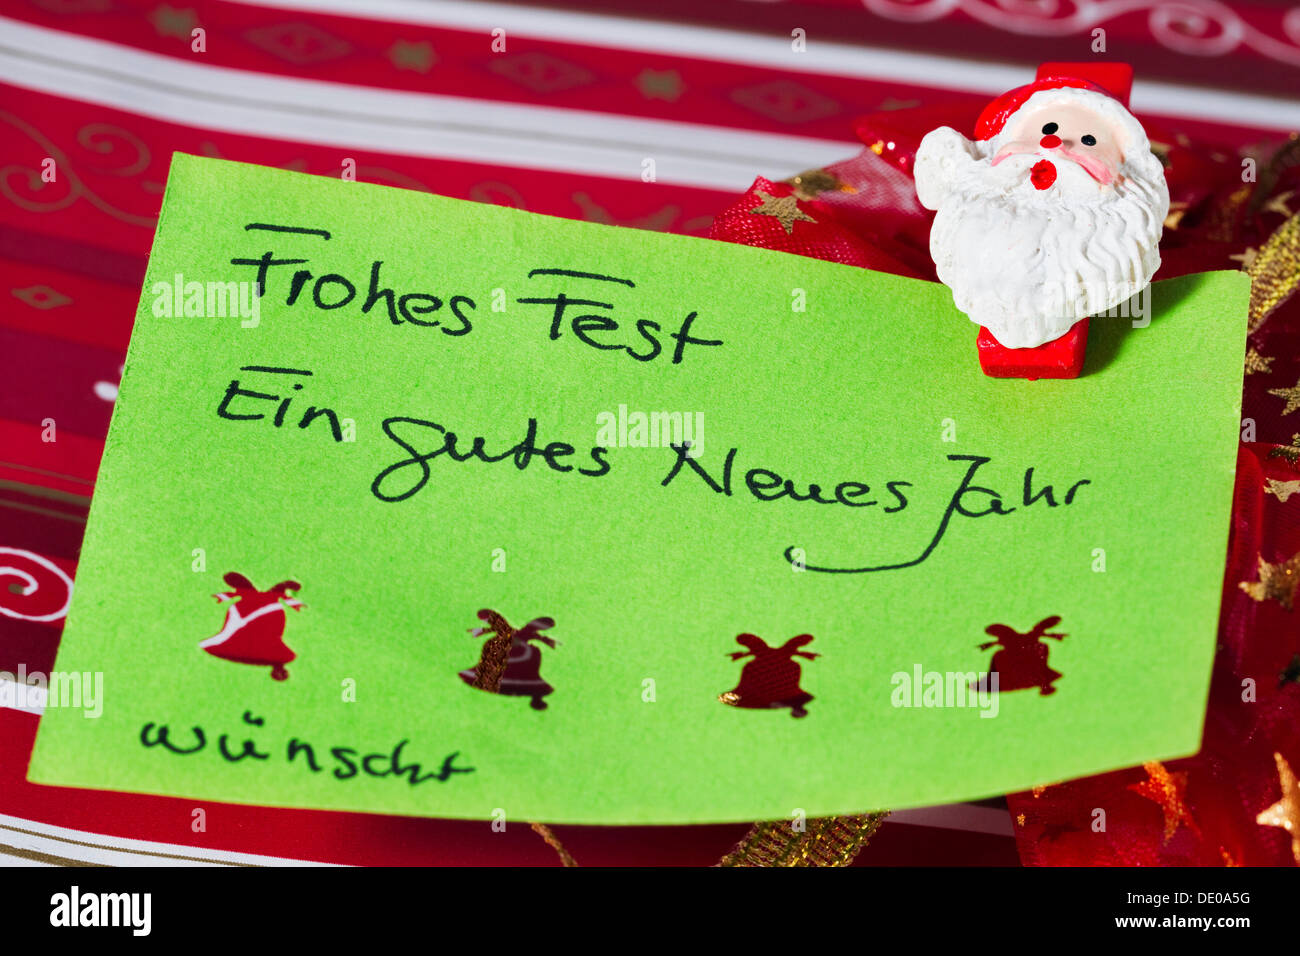 German new year greetings stock photos german new year greetings christmas greeting card frohes fest ein gutes neues jahr german for merry christmas m4hsunfo